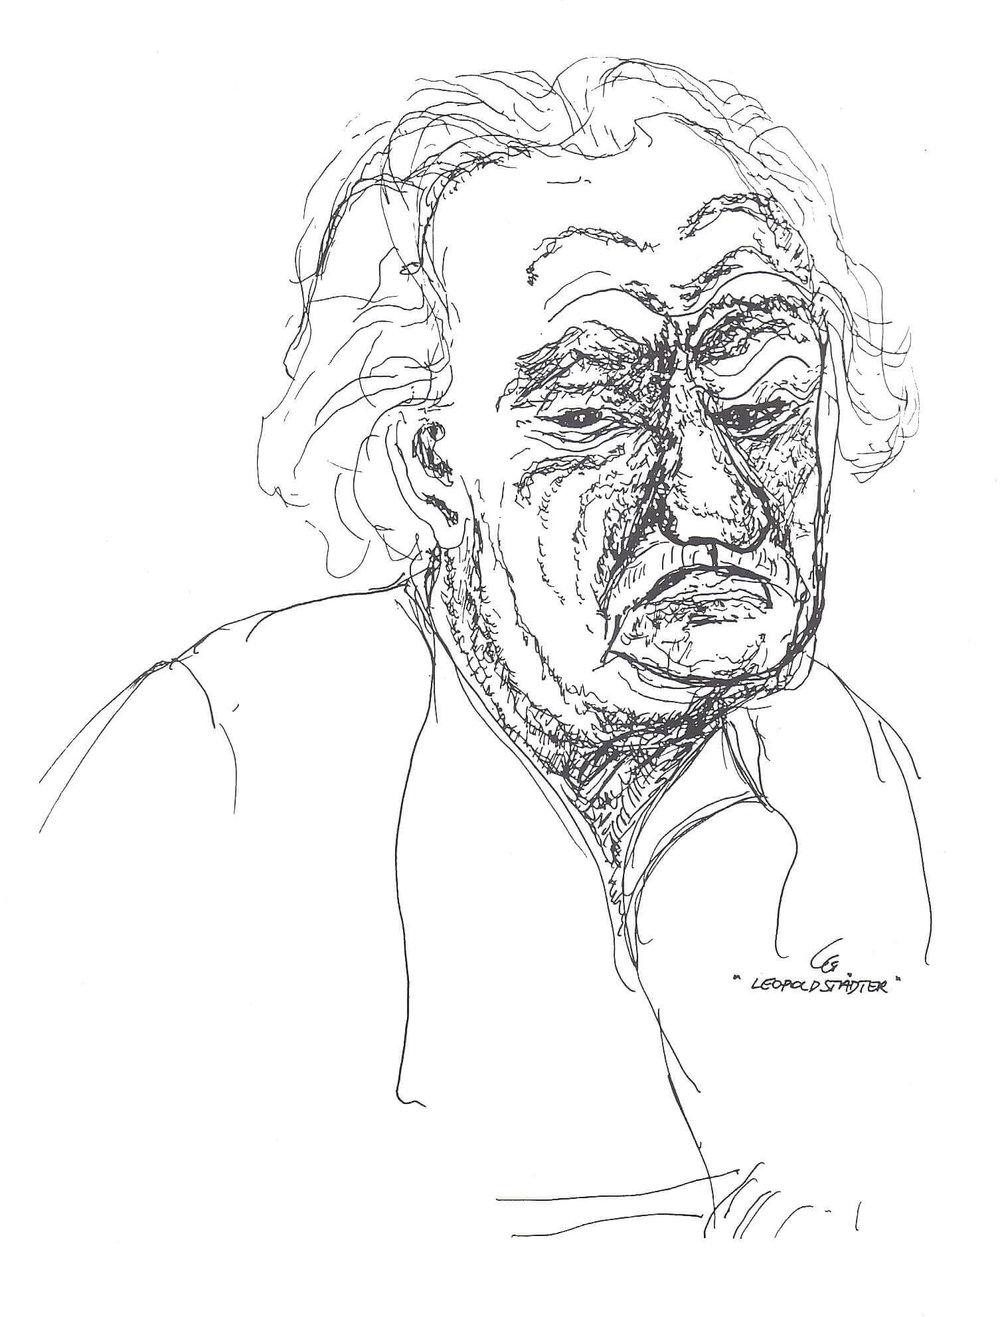 Sad face of old man